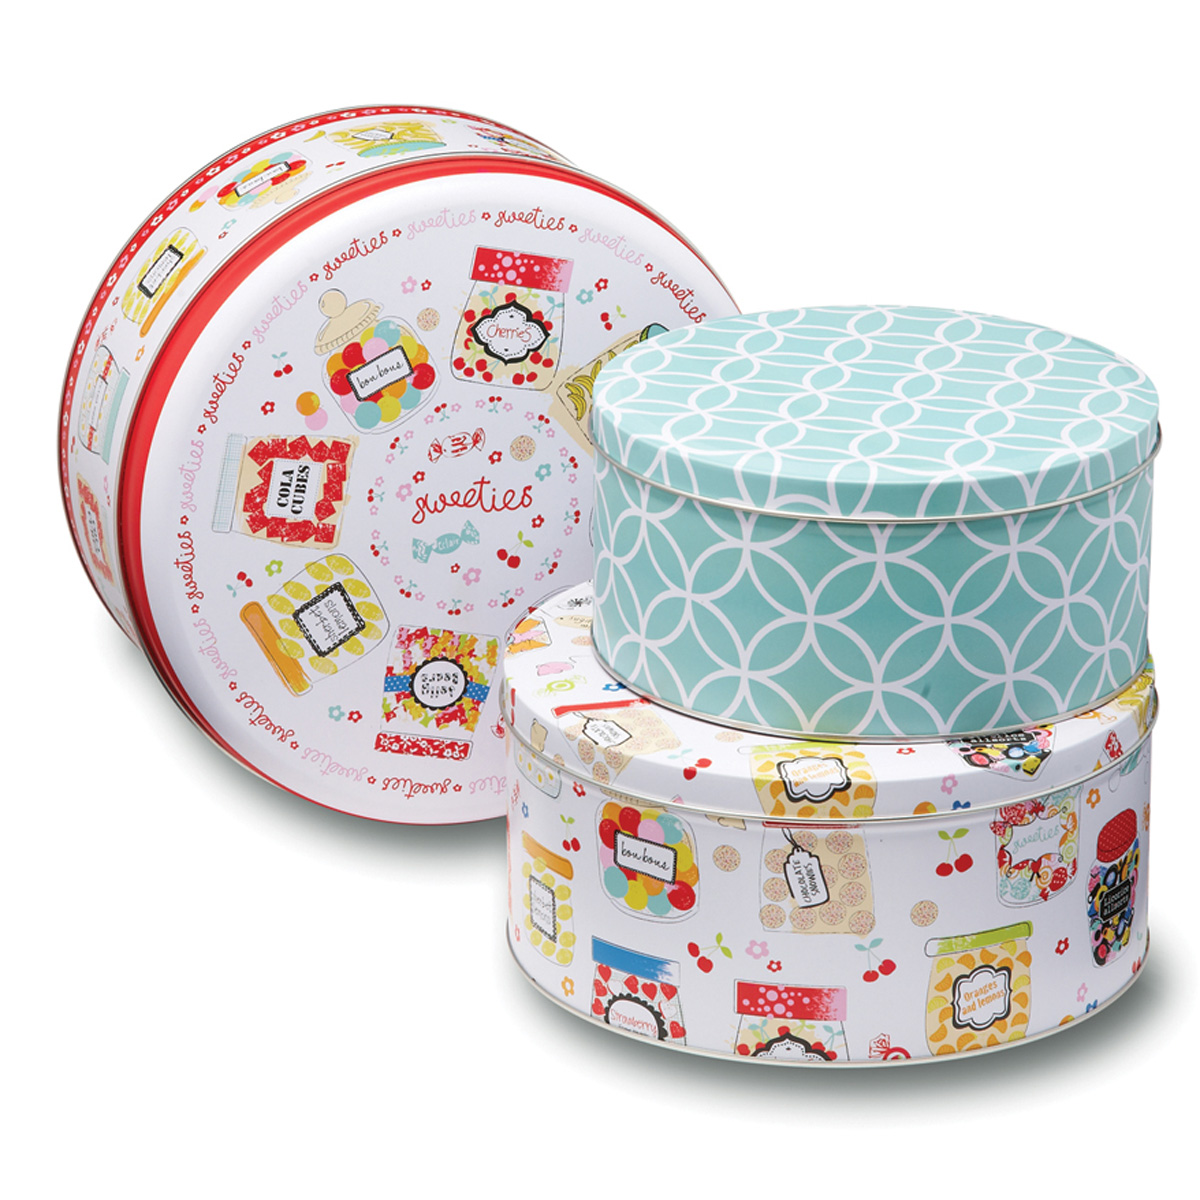 new cooksmart kitchen 3 pack sweet treats round baking. Black Bedroom Furniture Sets. Home Design Ideas